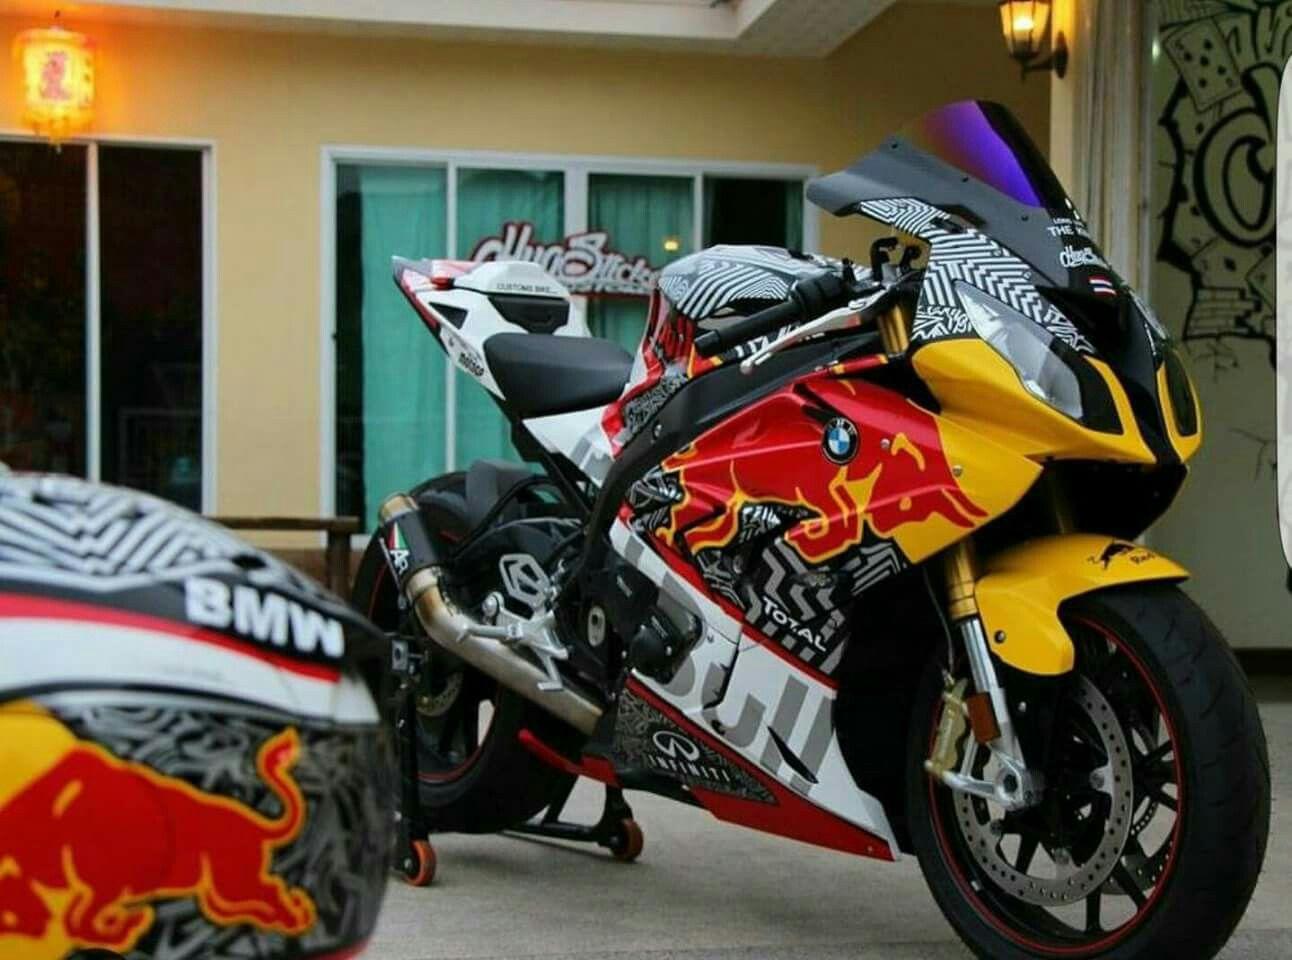 BMW Srr Sticker Job Redbull Motorcycle Pinterest Bmw - Red bull motorcycle custom stickers